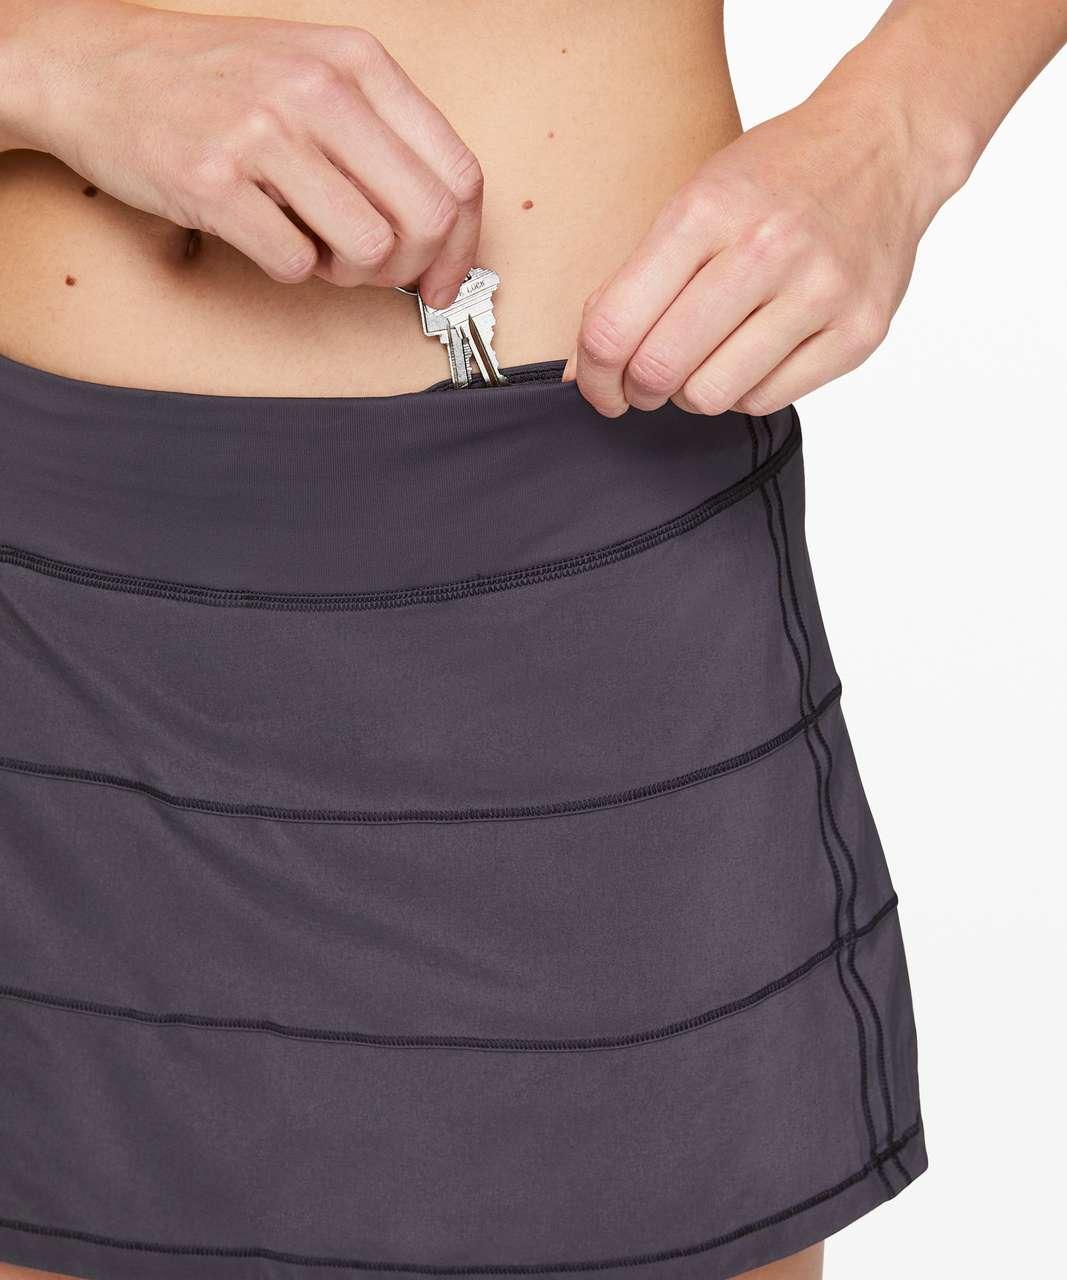 "Lululemon Pace Rival Skirt (Tall) *4-way Stretch 15"" - Moonwalk"